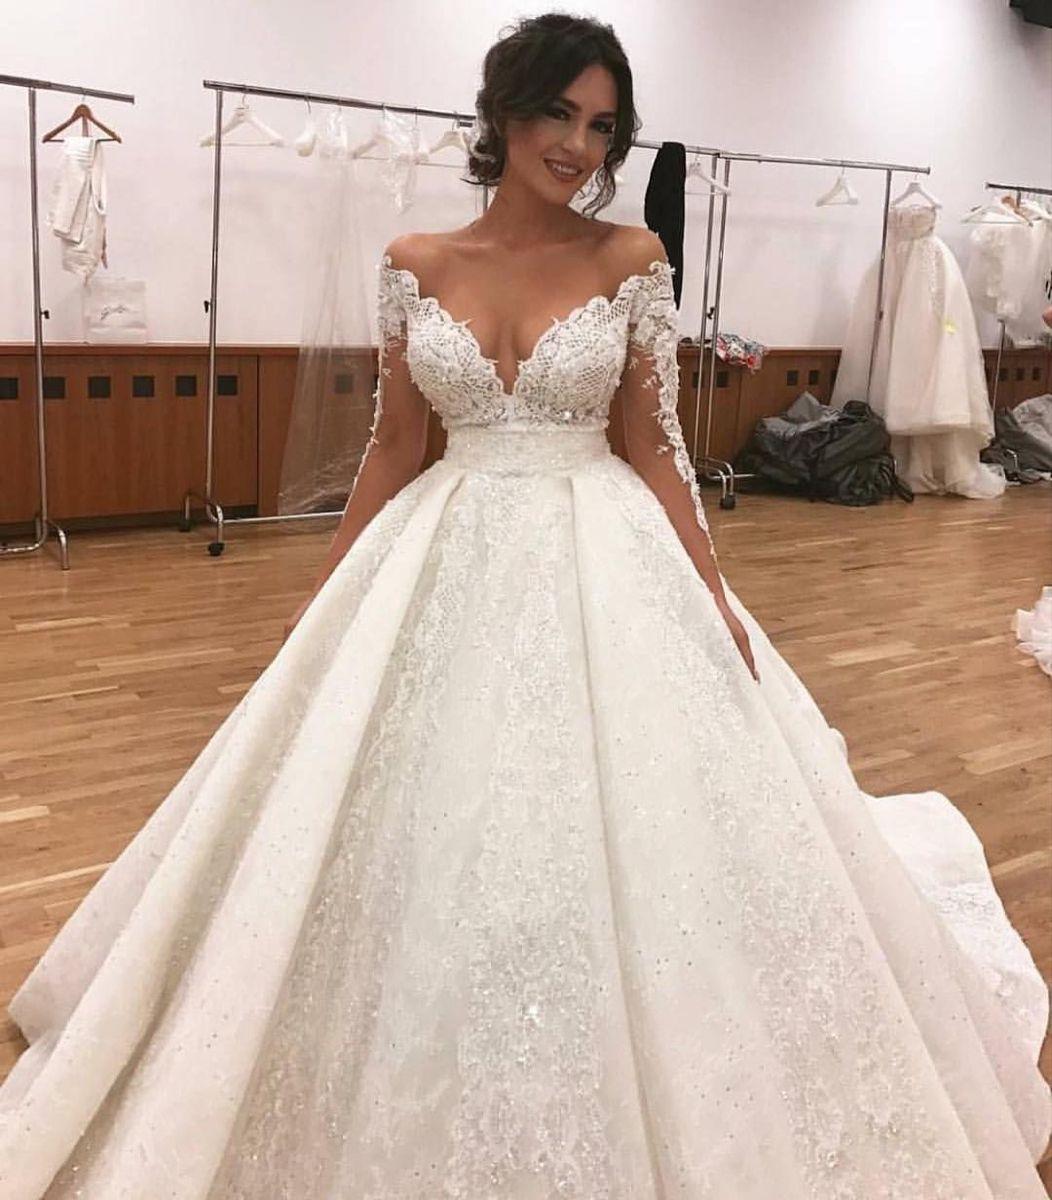 Custom Handmade Wedding Dress Exclusive High Quality Fabric Ball Gown Wedding Dress Ball Gowns Wedding Long Sleeve Wedding Dress Lace [ 1200 x 1052 Pixel ]